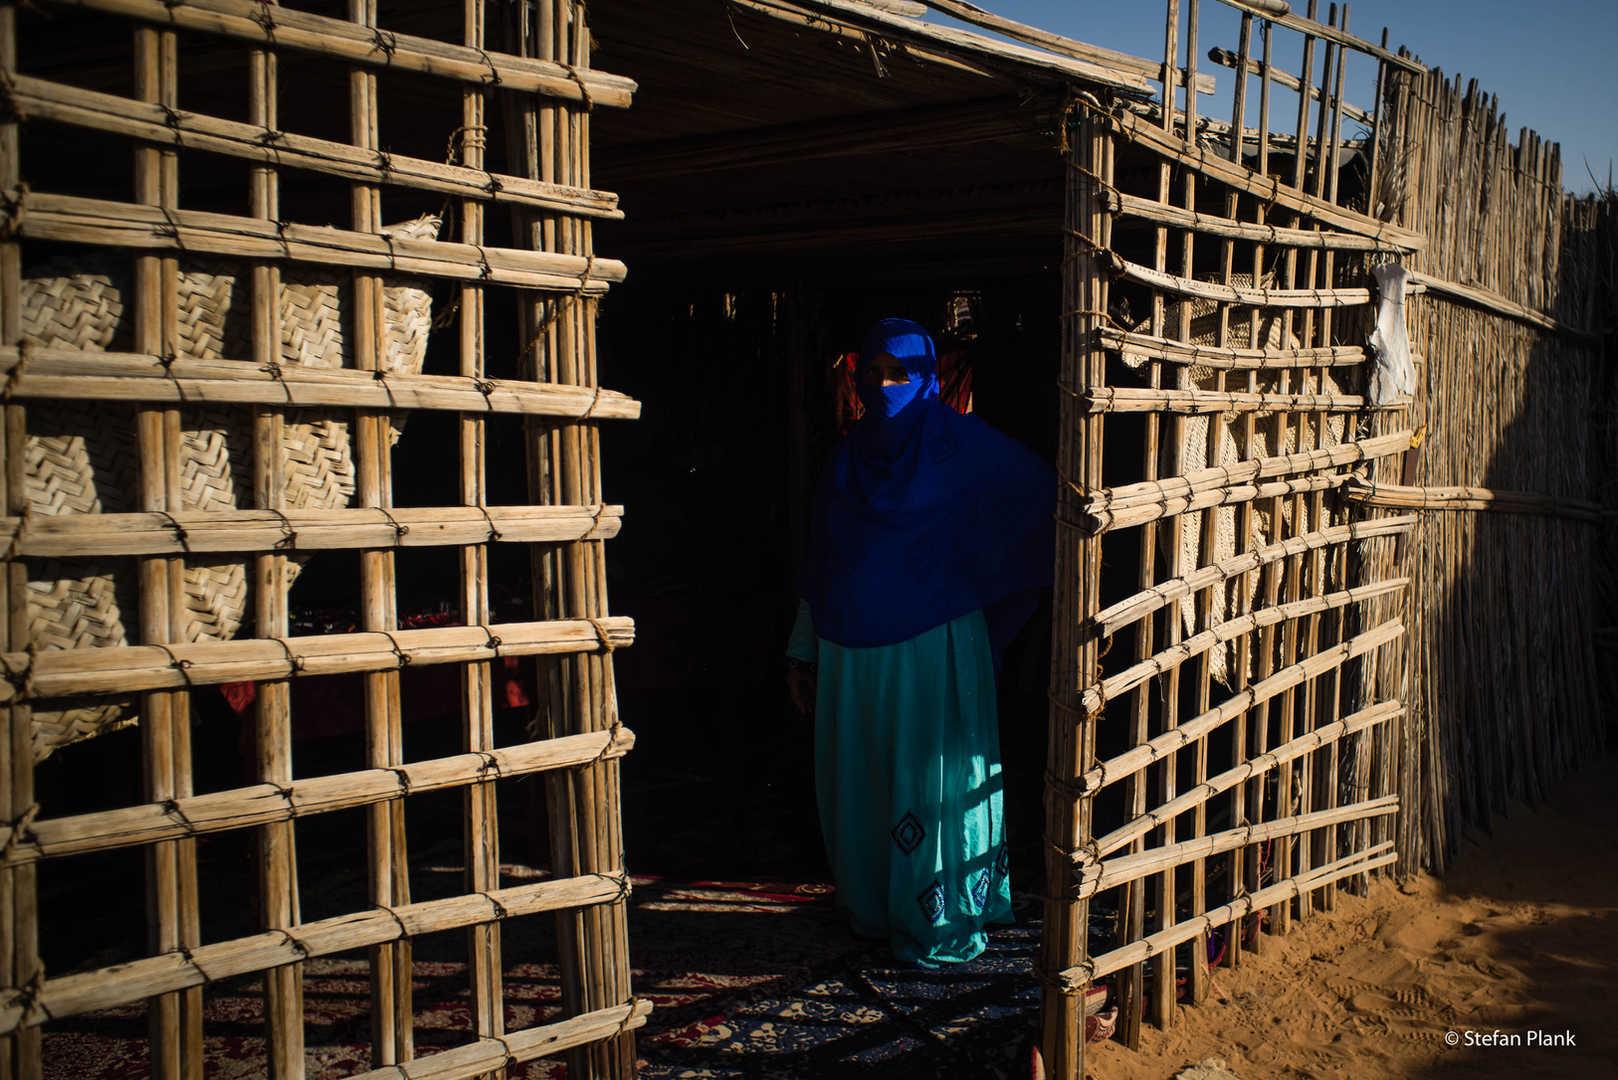 Nomaden in der Ramlat al Wahiba